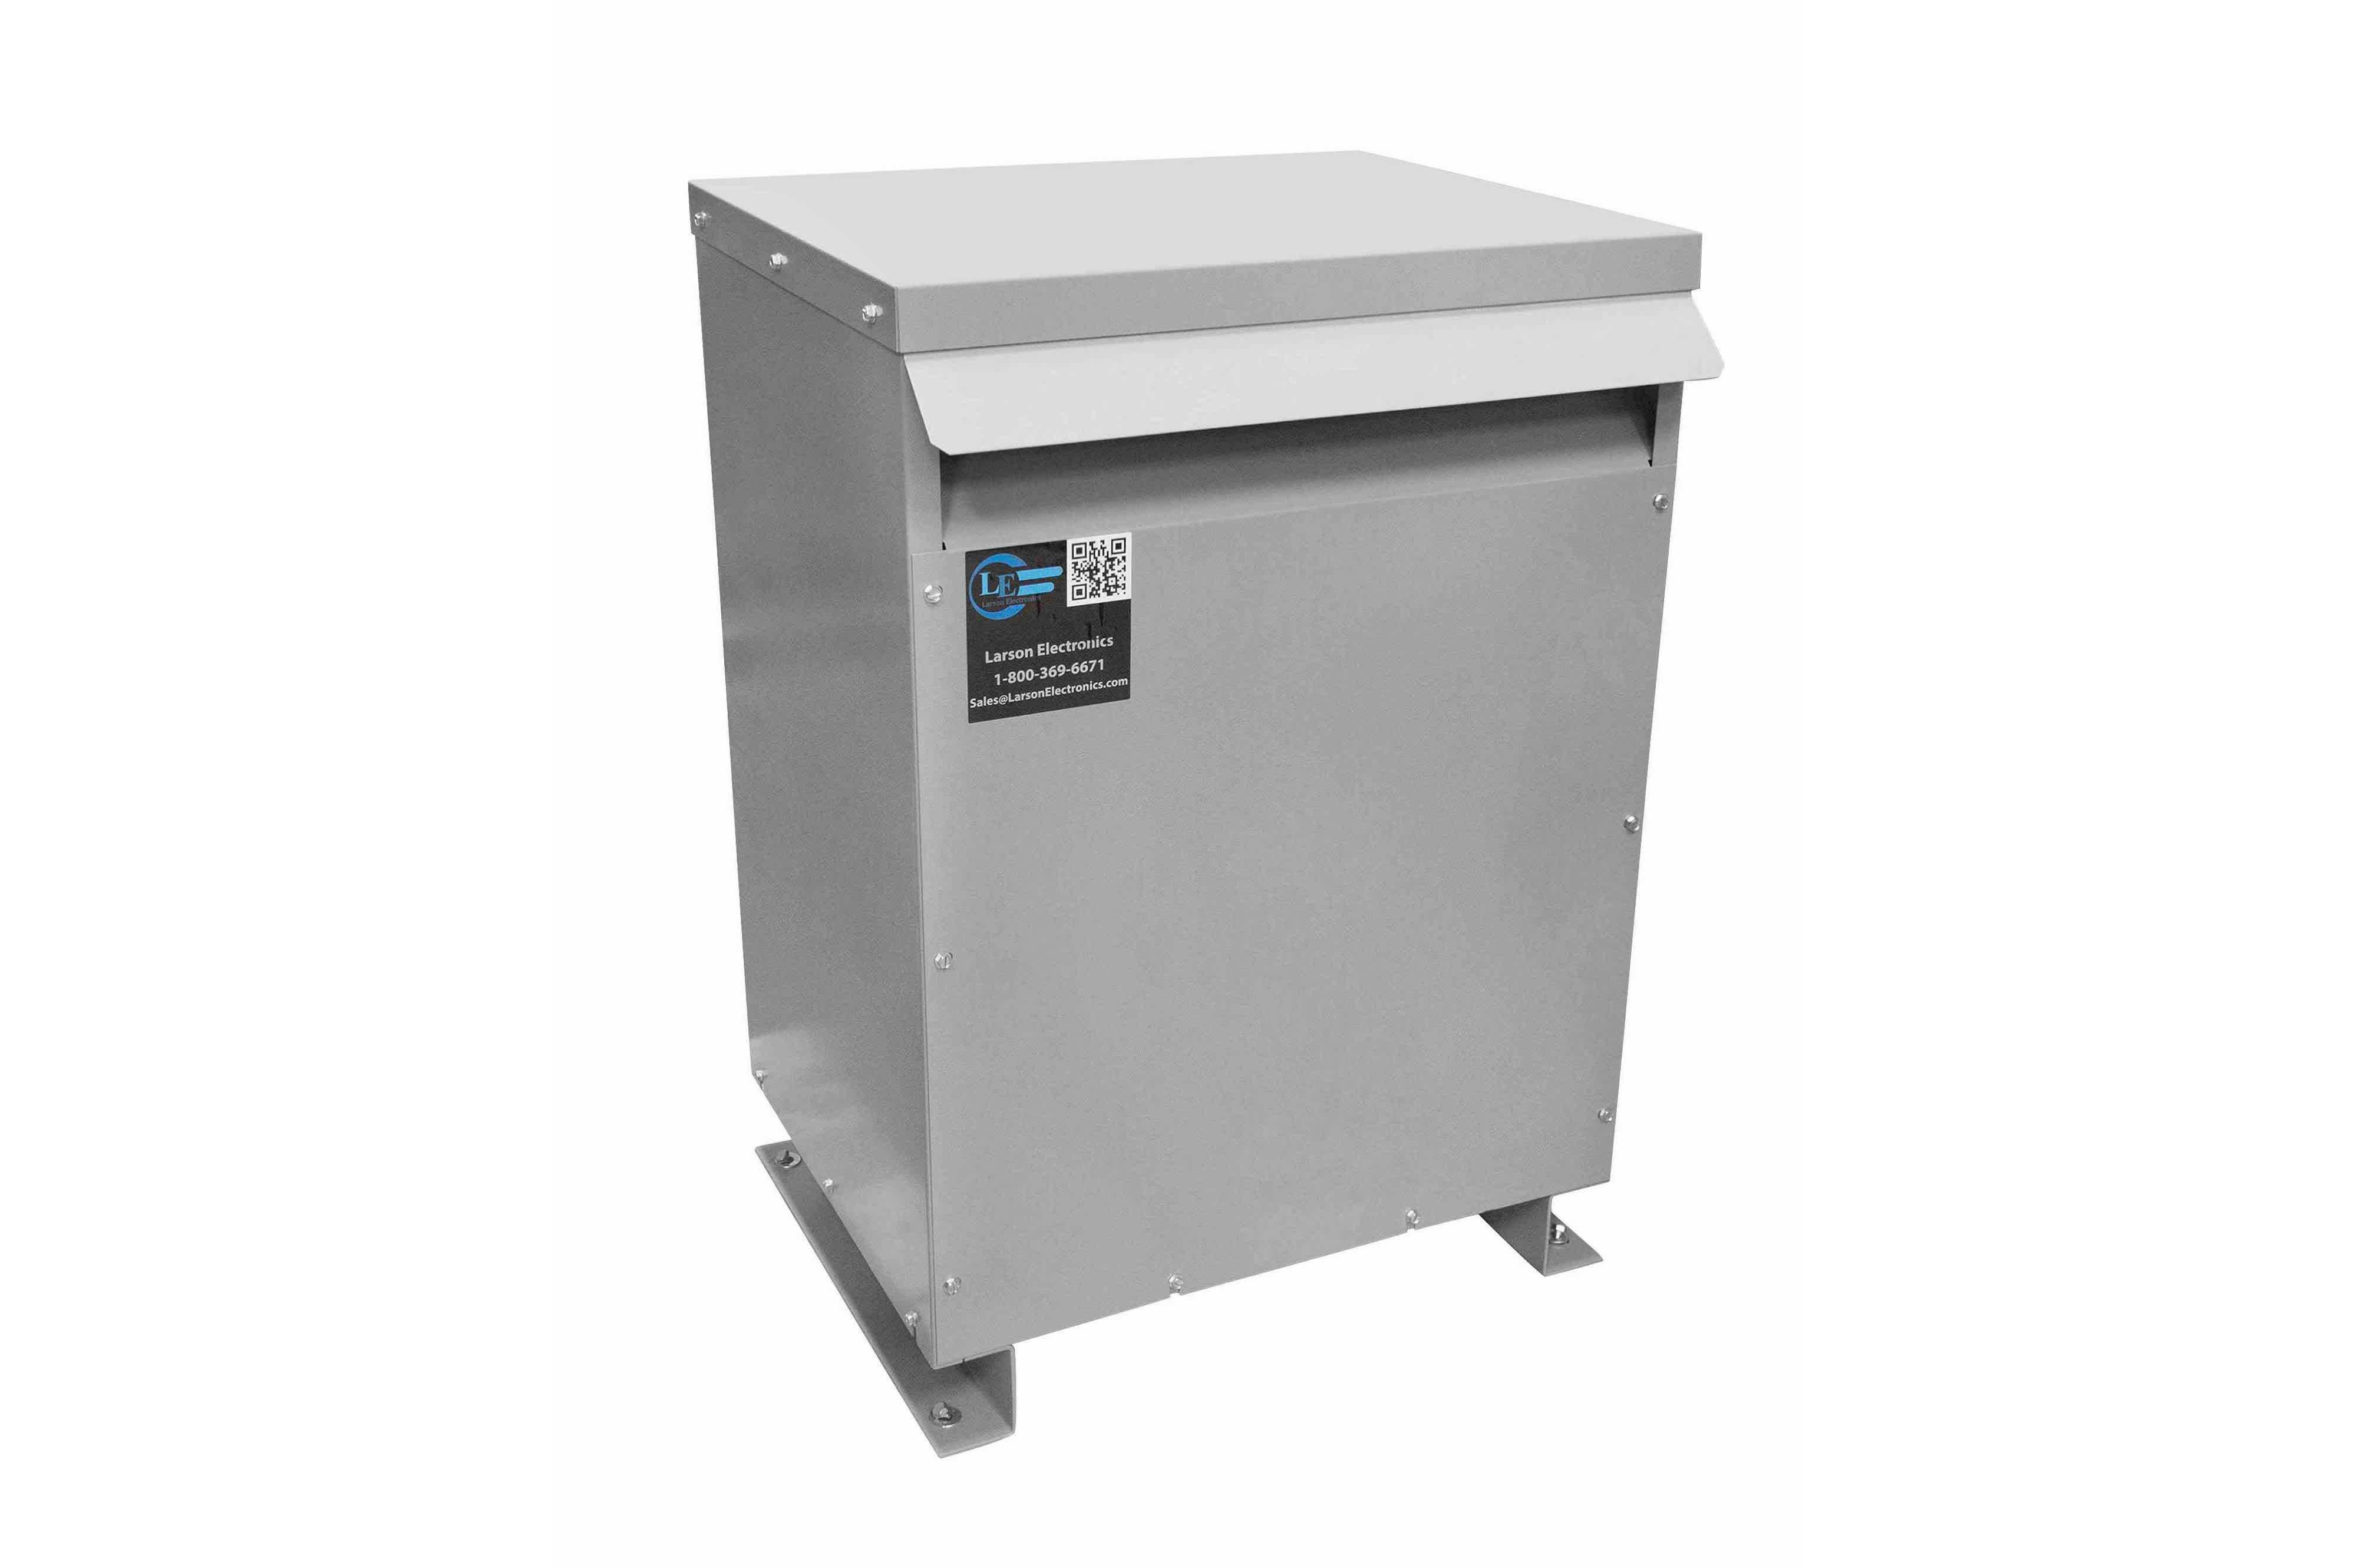 600 kVA 3PH Isolation Transformer, 480V Wye Primary, 240V/120 Delta Secondary, N3R, Ventilated, 60 Hz